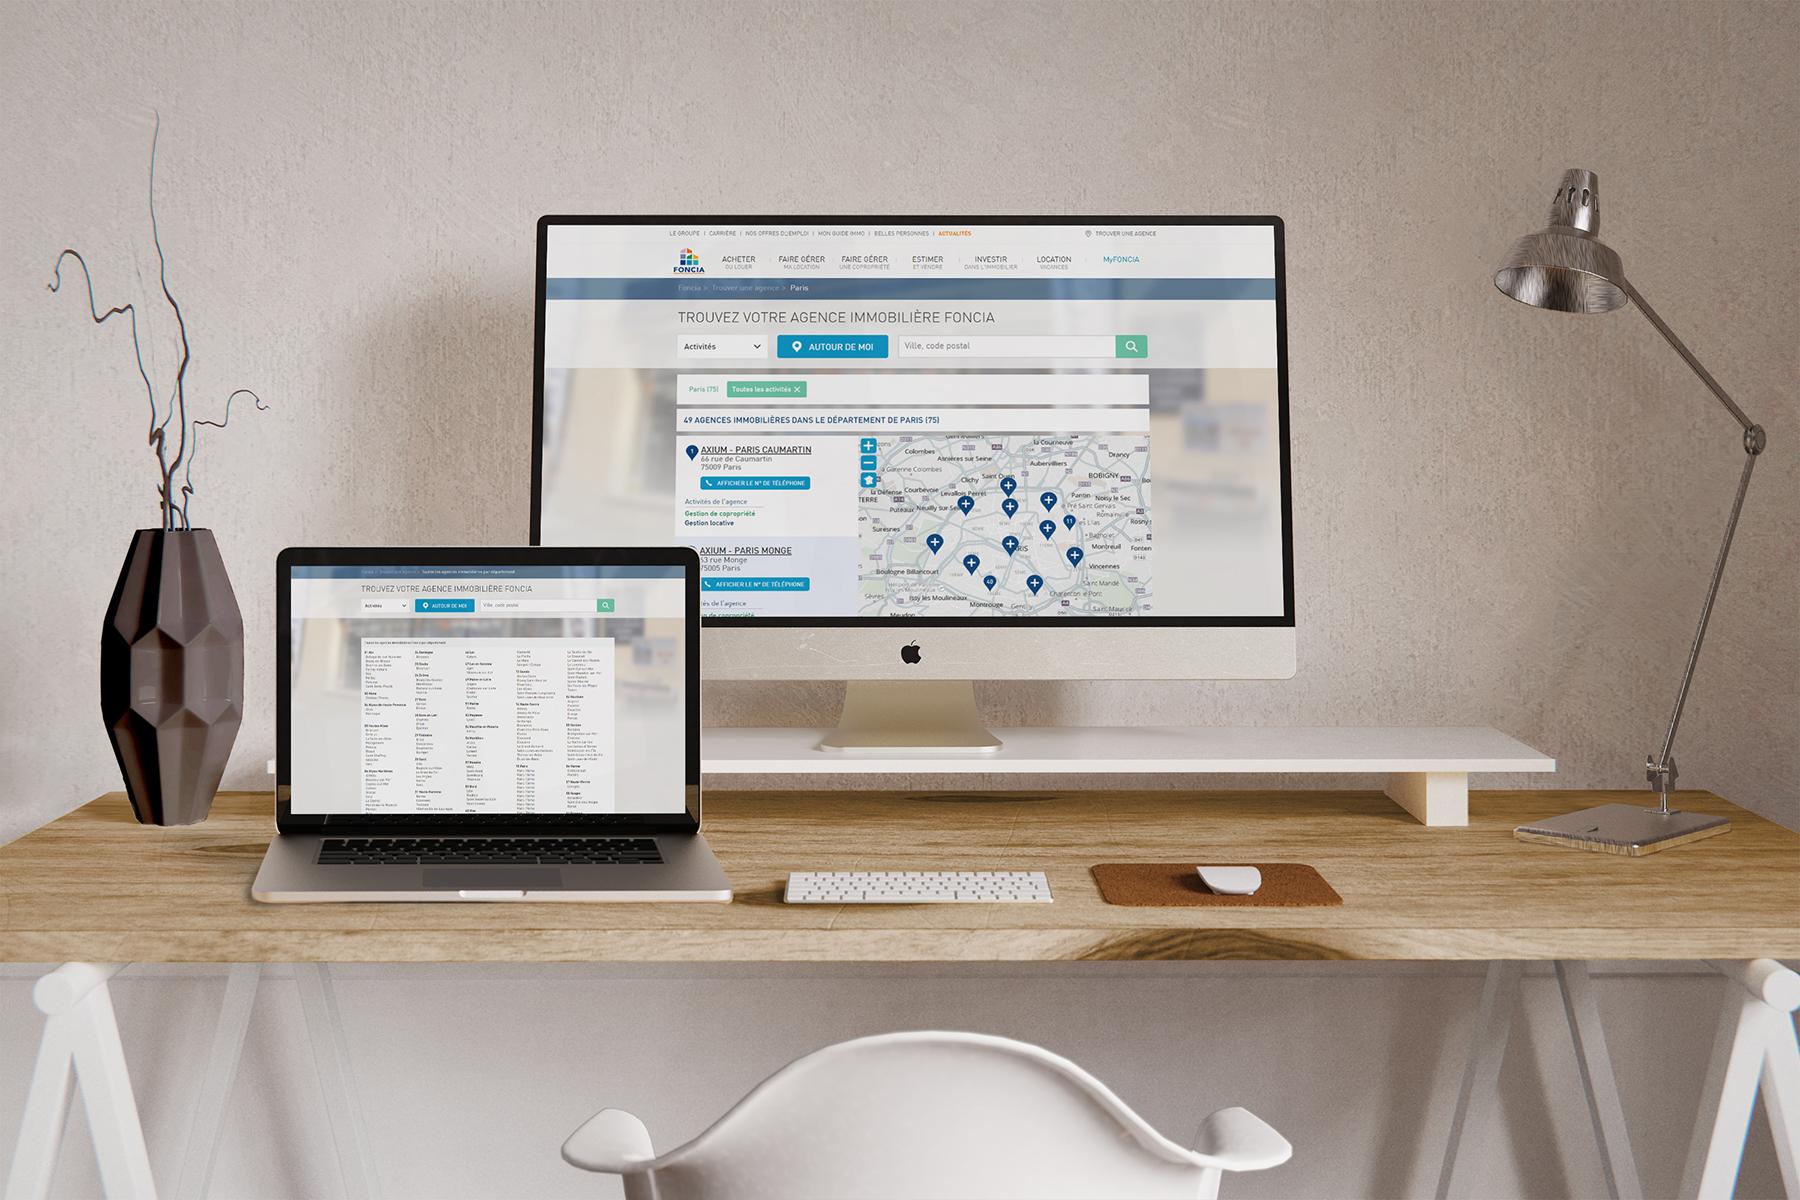 Store Locator Foncia desktop